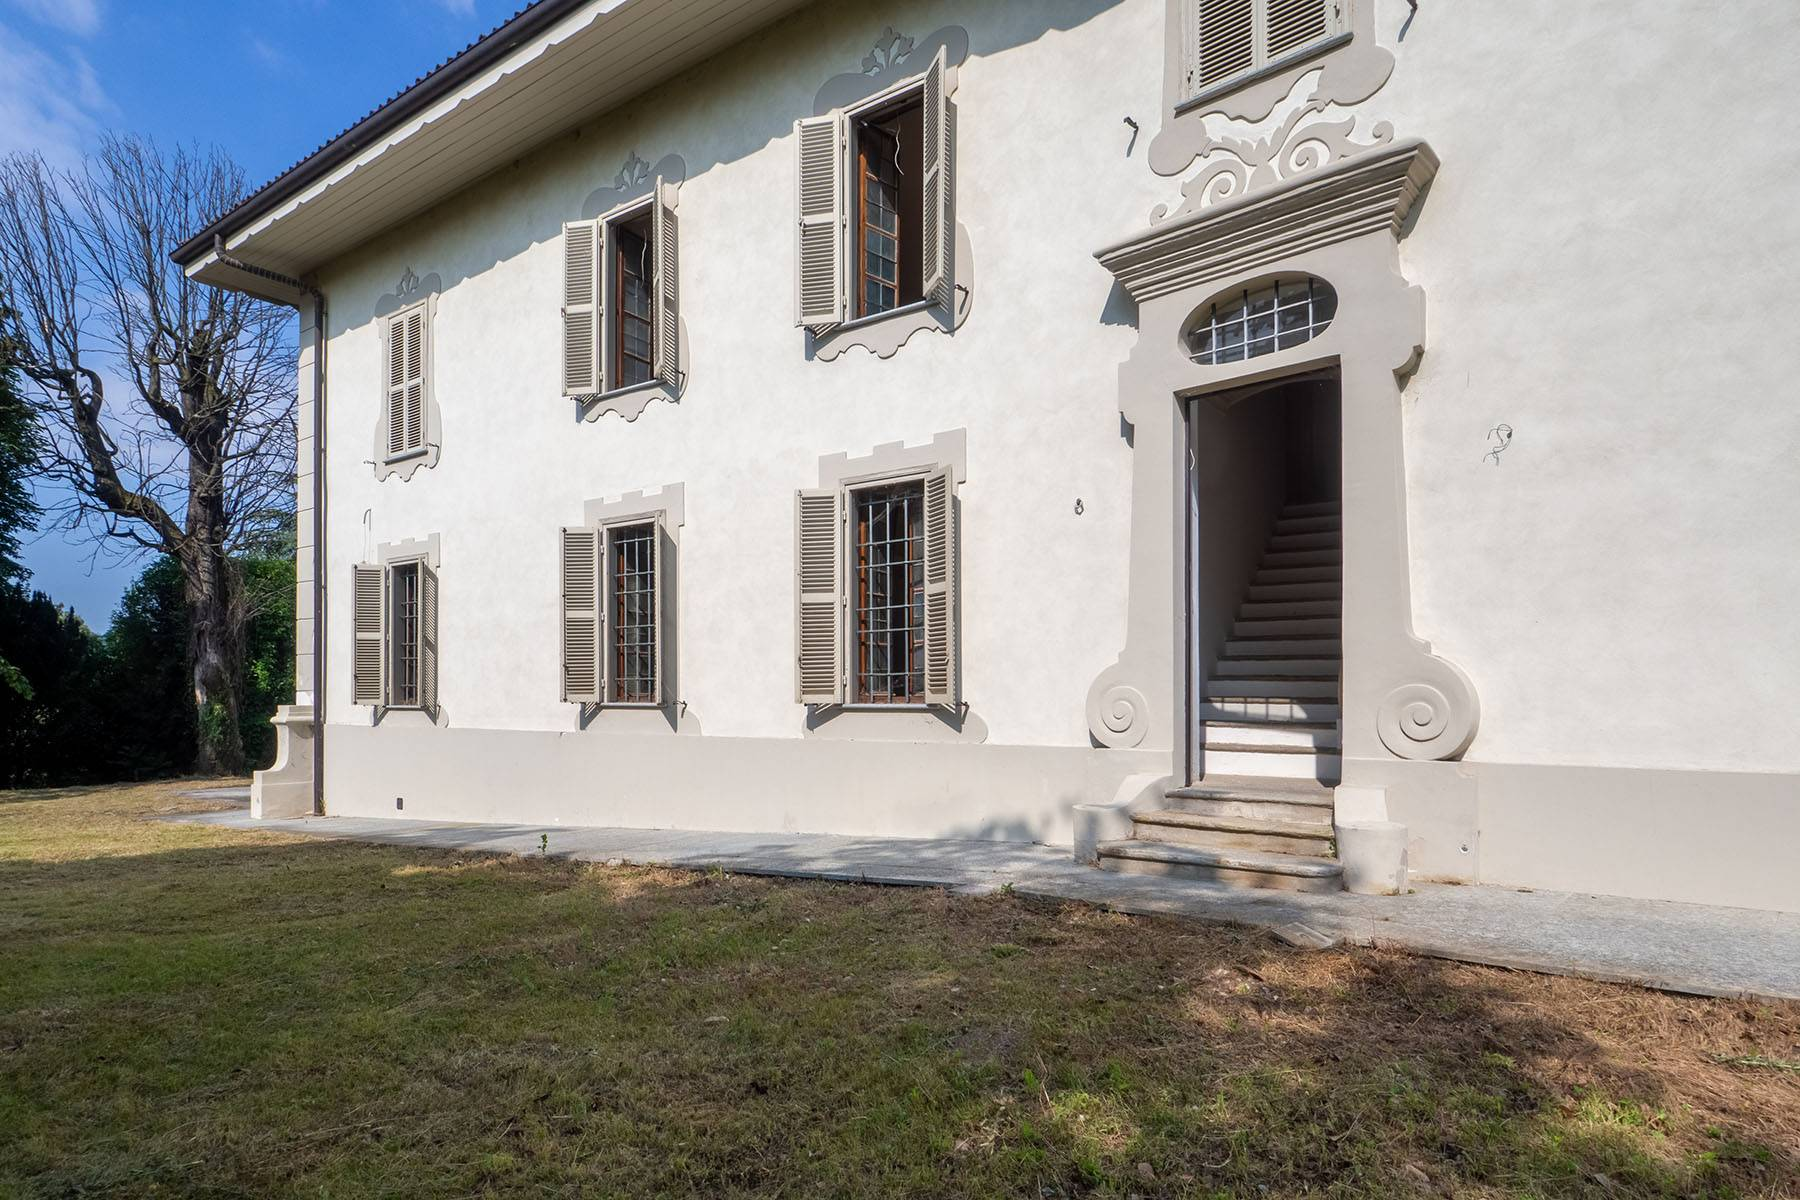 Casa indipendente in Vendita a Torino: 5 locali, 400 mq - Foto 4